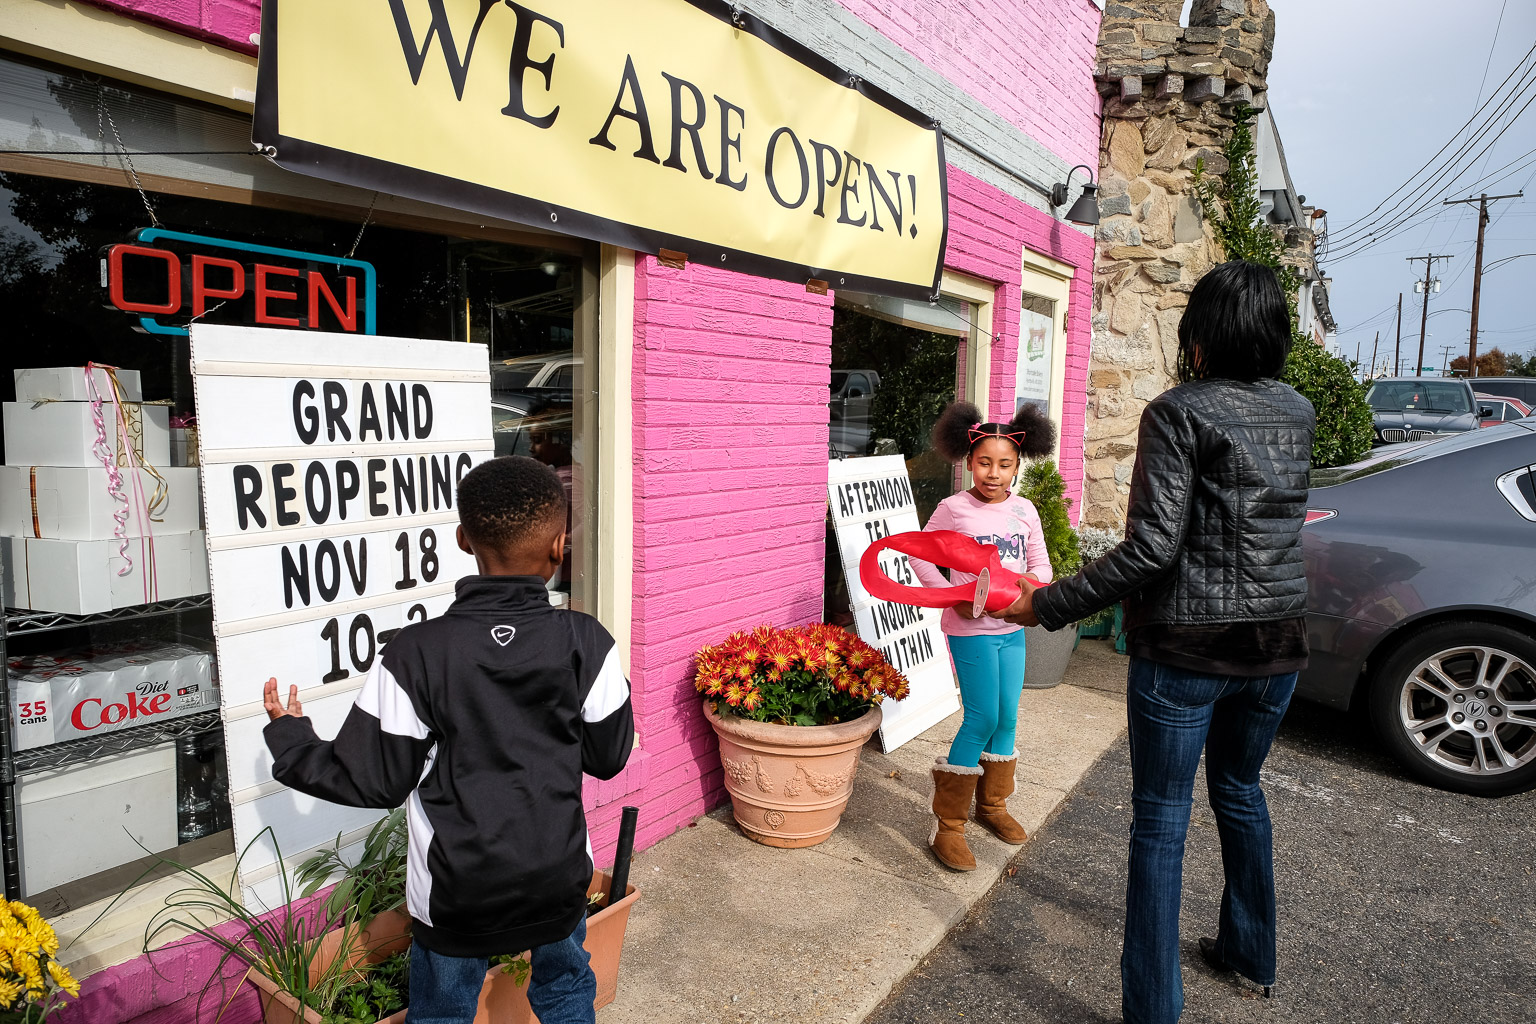 Shortcake_Reopening_11-18-17-022-Lenzy-Ruffin-Event-Photography-Washington-DC-Fuji-X-T2.jpg